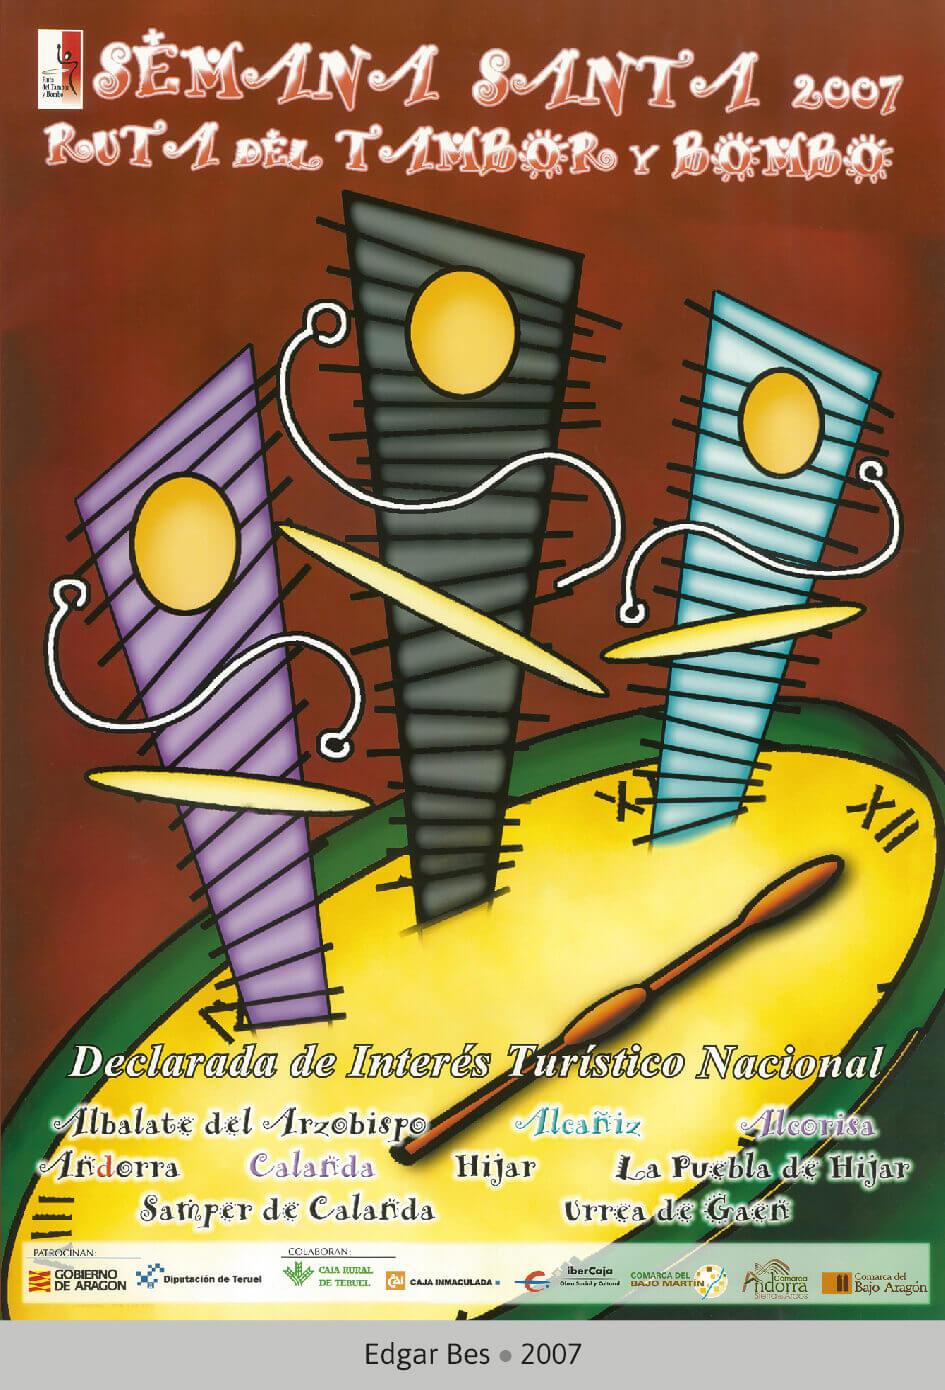 Cartel Ganador Ruta del Tambor y Bombo. Semana Santa 2007